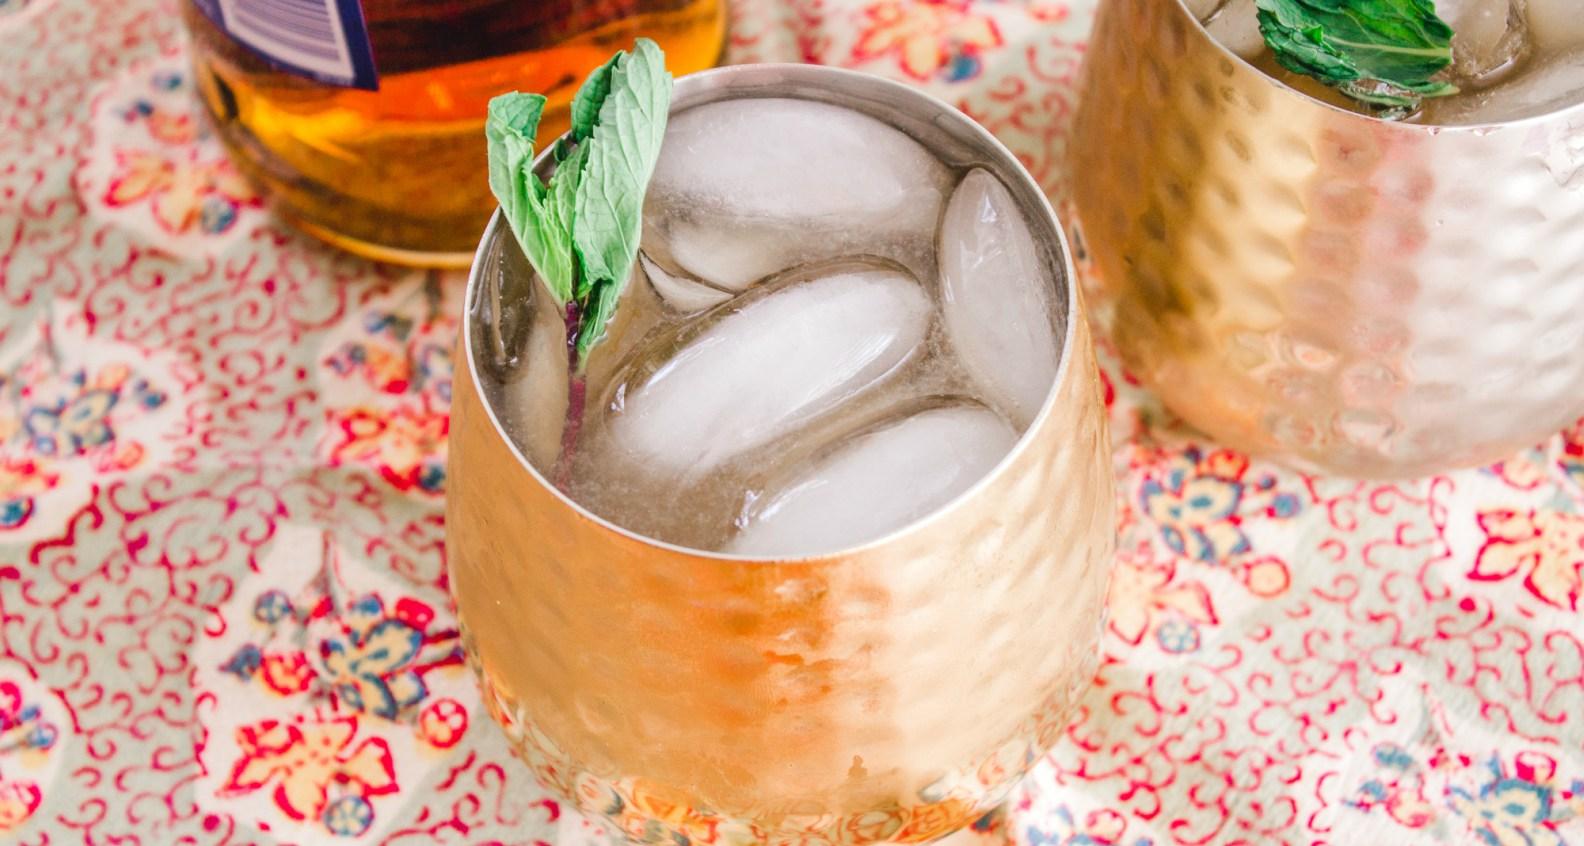 Bourbon-Mint Arnold Palmer Cocktail